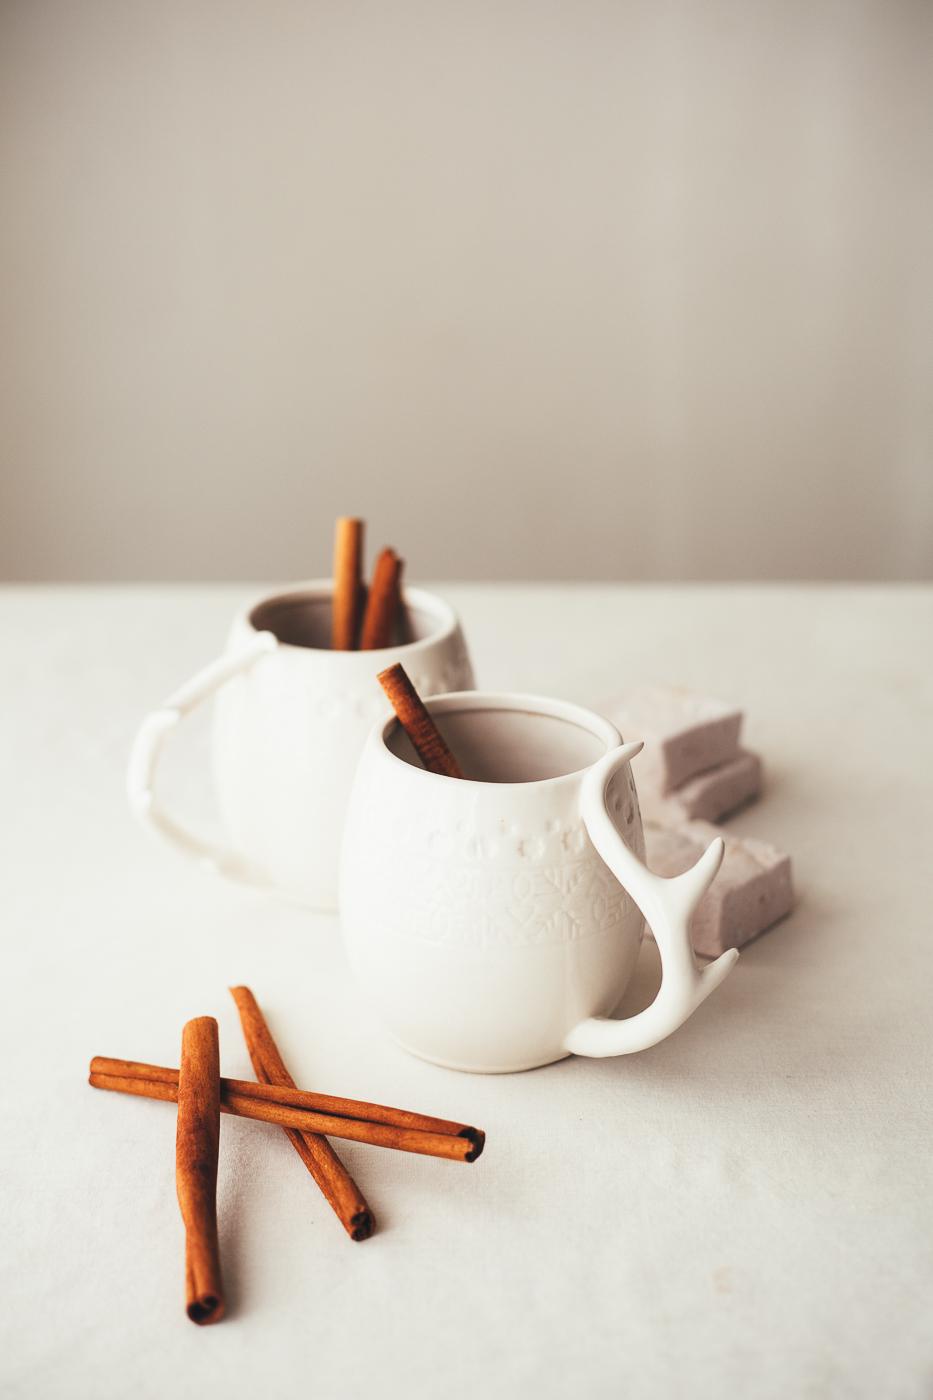 mexican-hot-cocoa-3.jpg